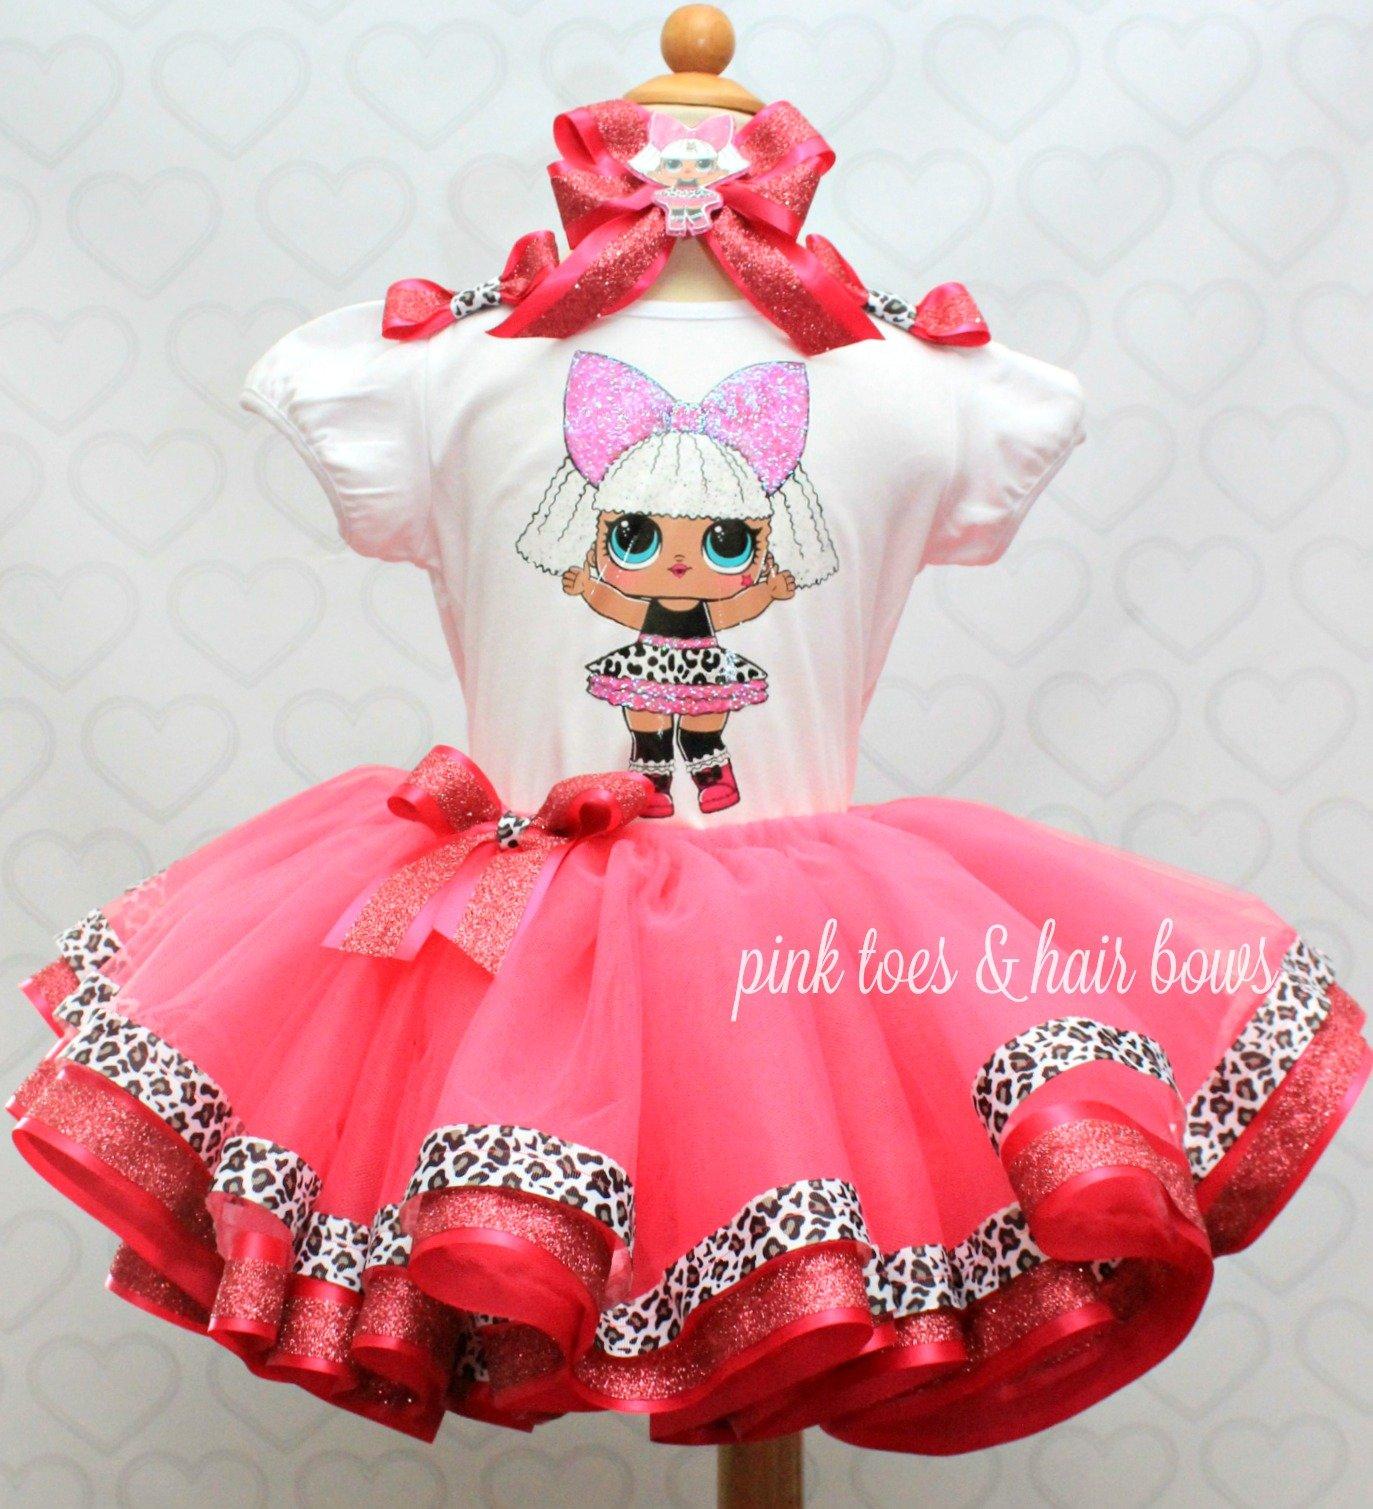 5151a9587 Diva lol surprise doll tutu set-Diva lol surprise outfit-Diva lol dress